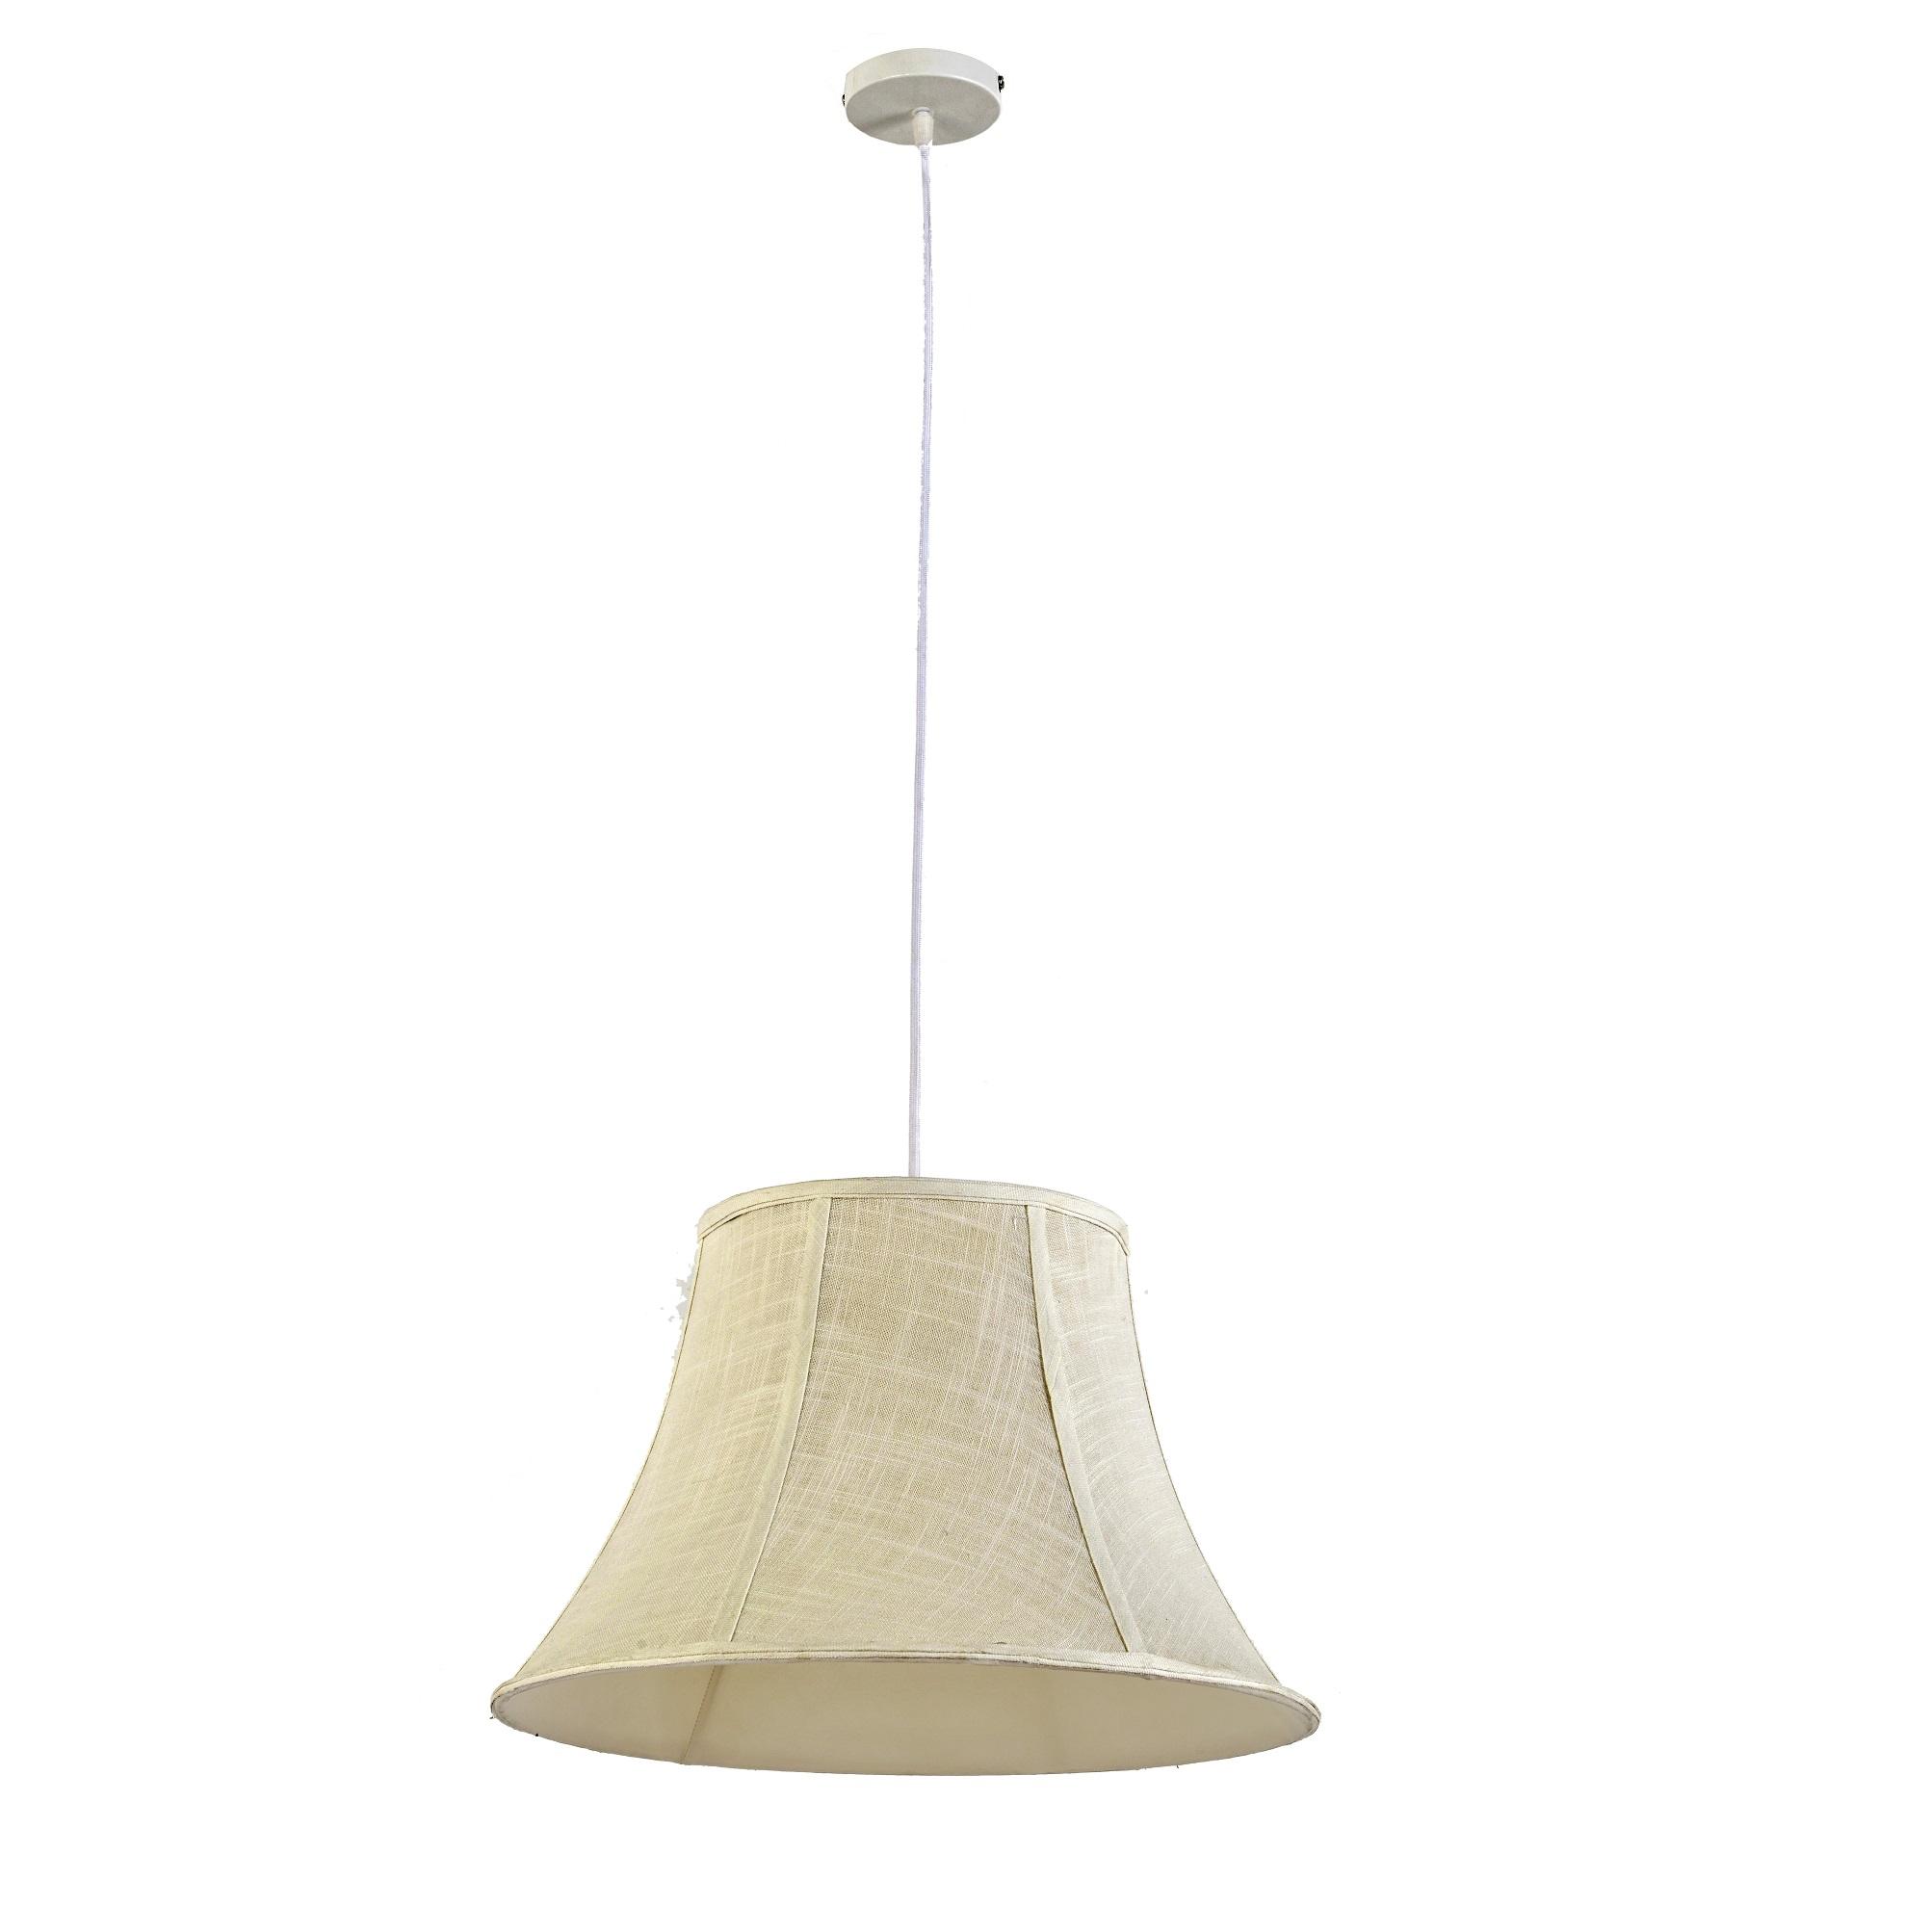 Фото - Подвесной светильник Arti Lampadari Cantare E 1.3.P1 W подвесной светильник arti lampadari olio e 1 3 p1 br